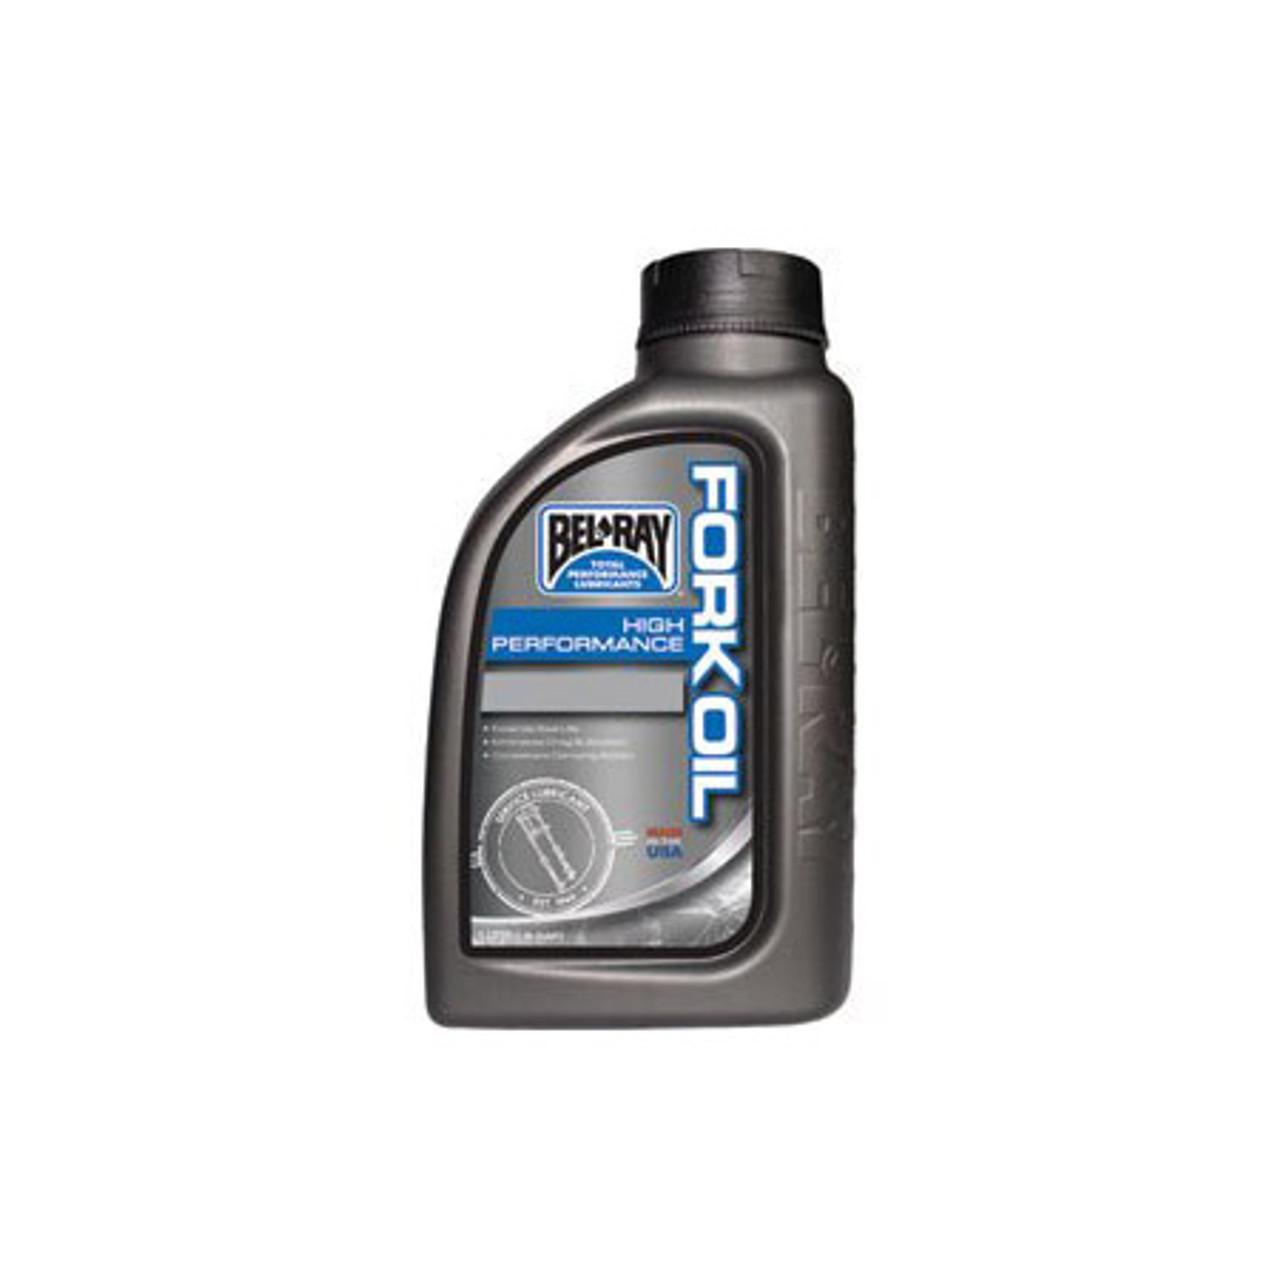 Bel-Ray High Performance Fork Oil 20WT